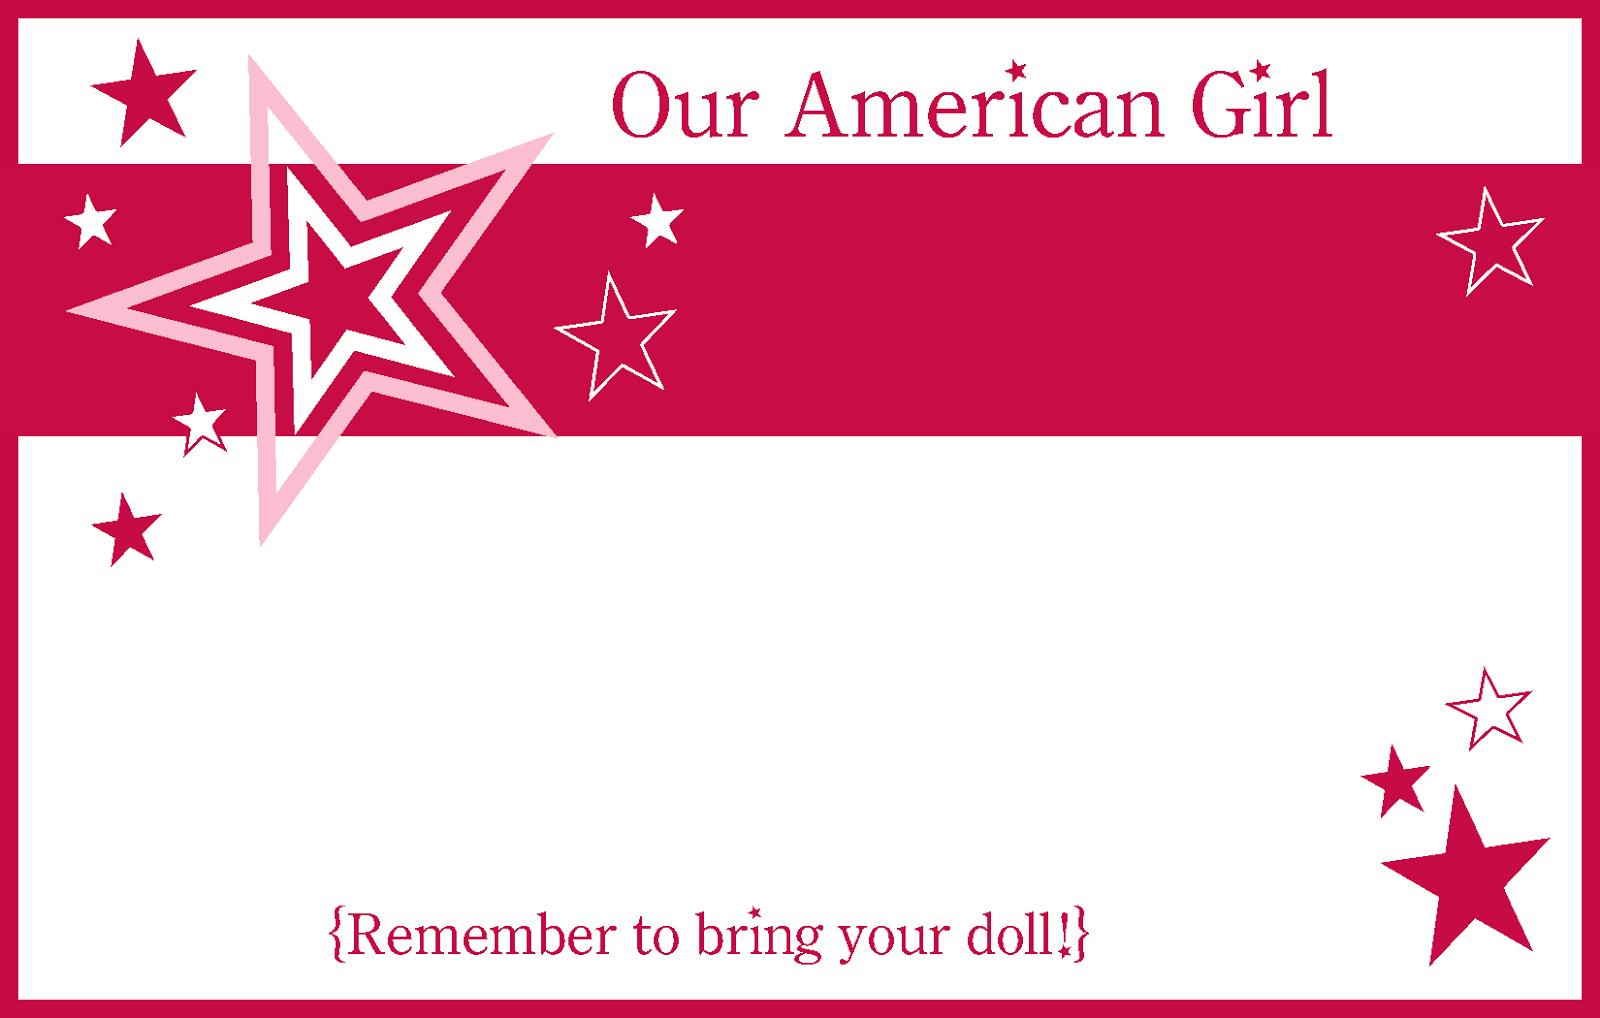 6/18/14American Girl Party Printablesamerican Girl Party Printables - American Girl Party Invitations Free Printable